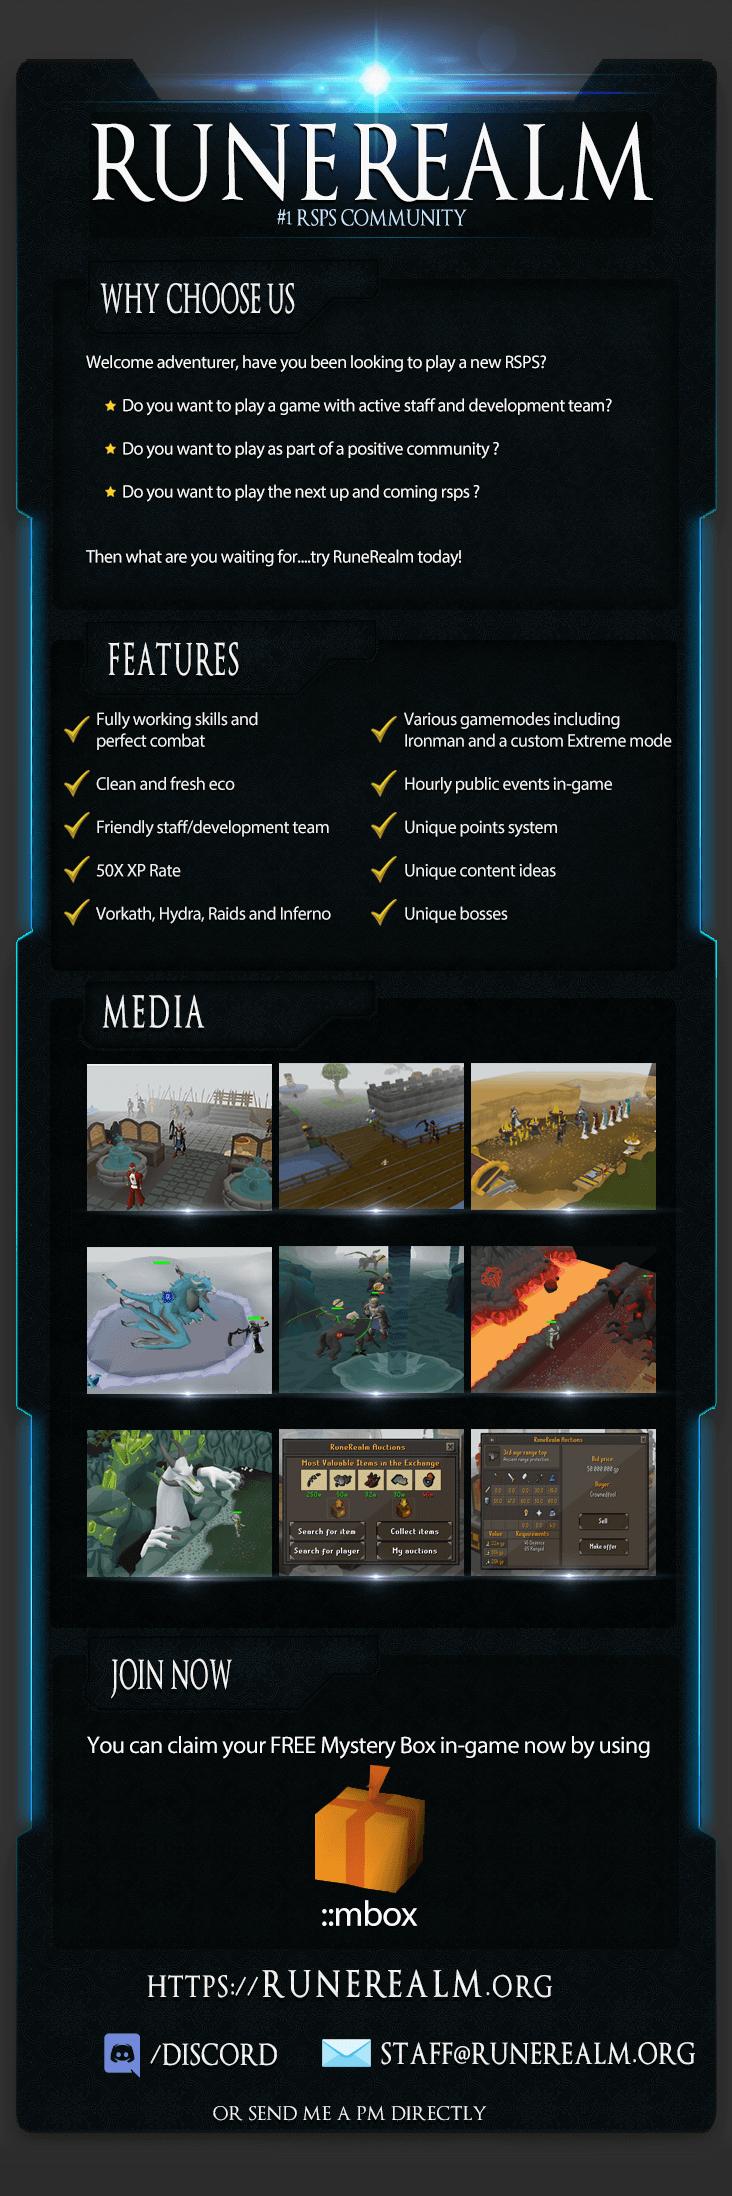 RuneRealm server information media